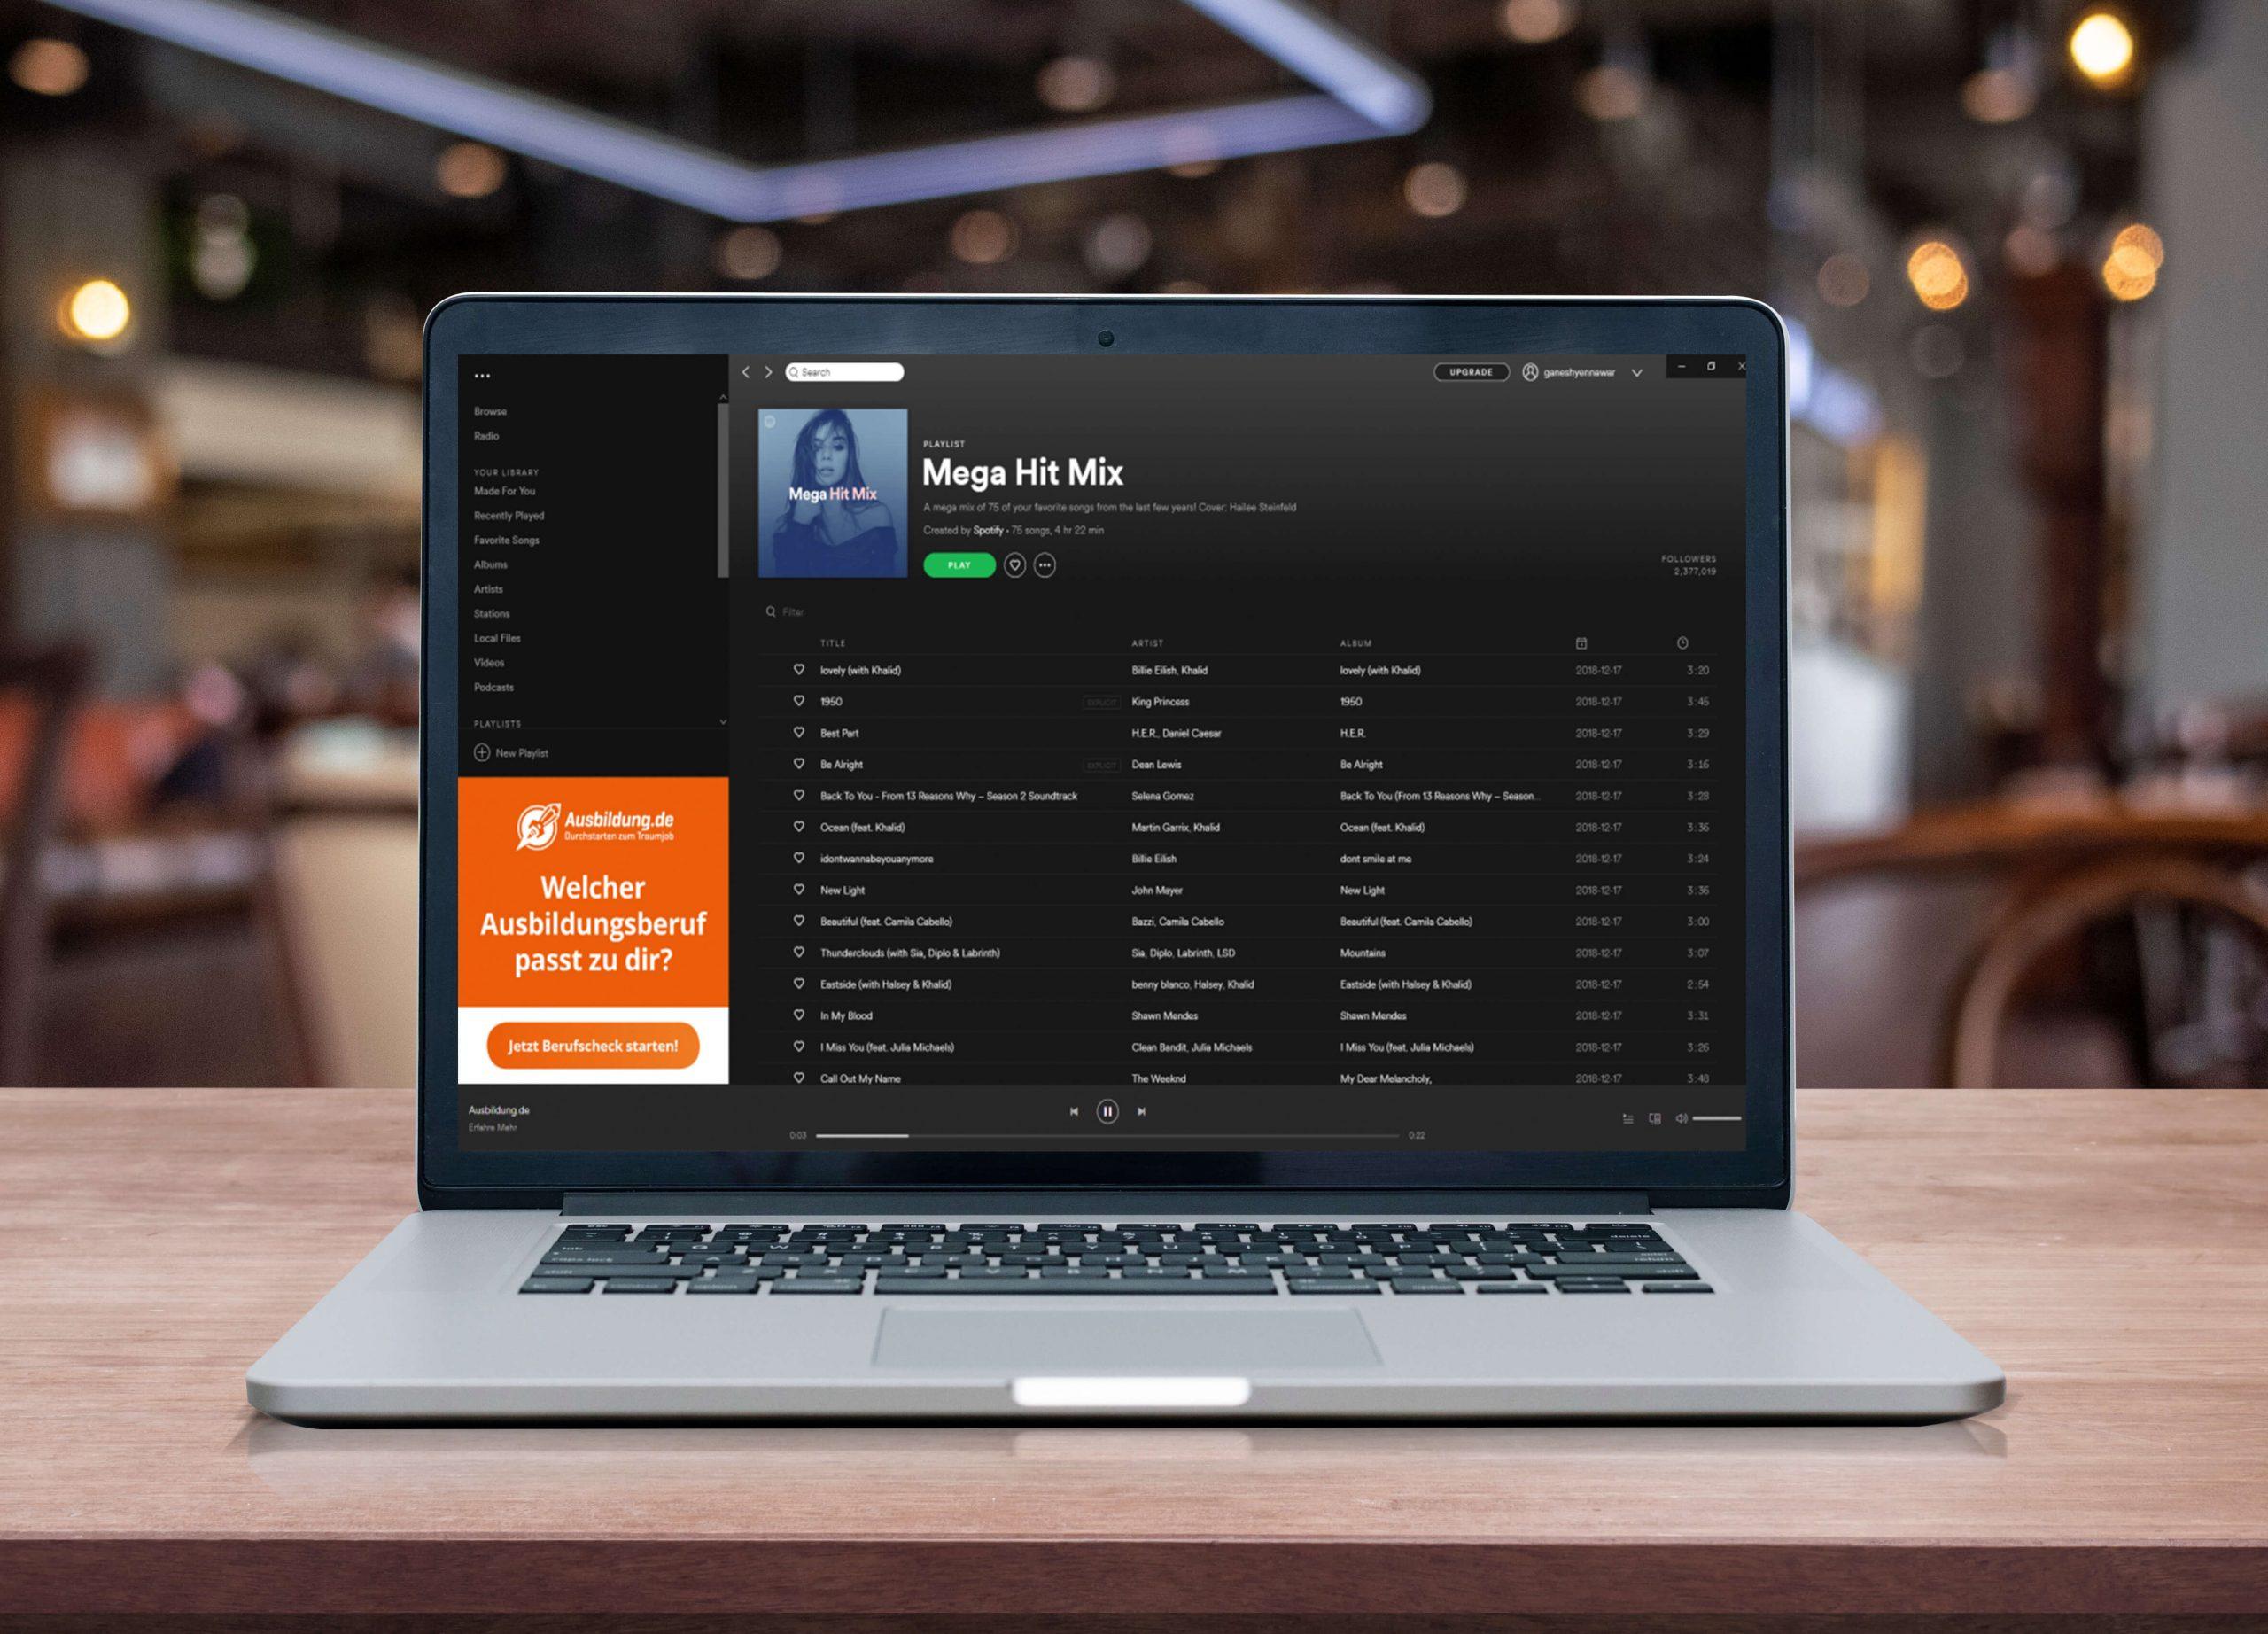 Ausbildung.de-Spotify-Kampagne-scaled